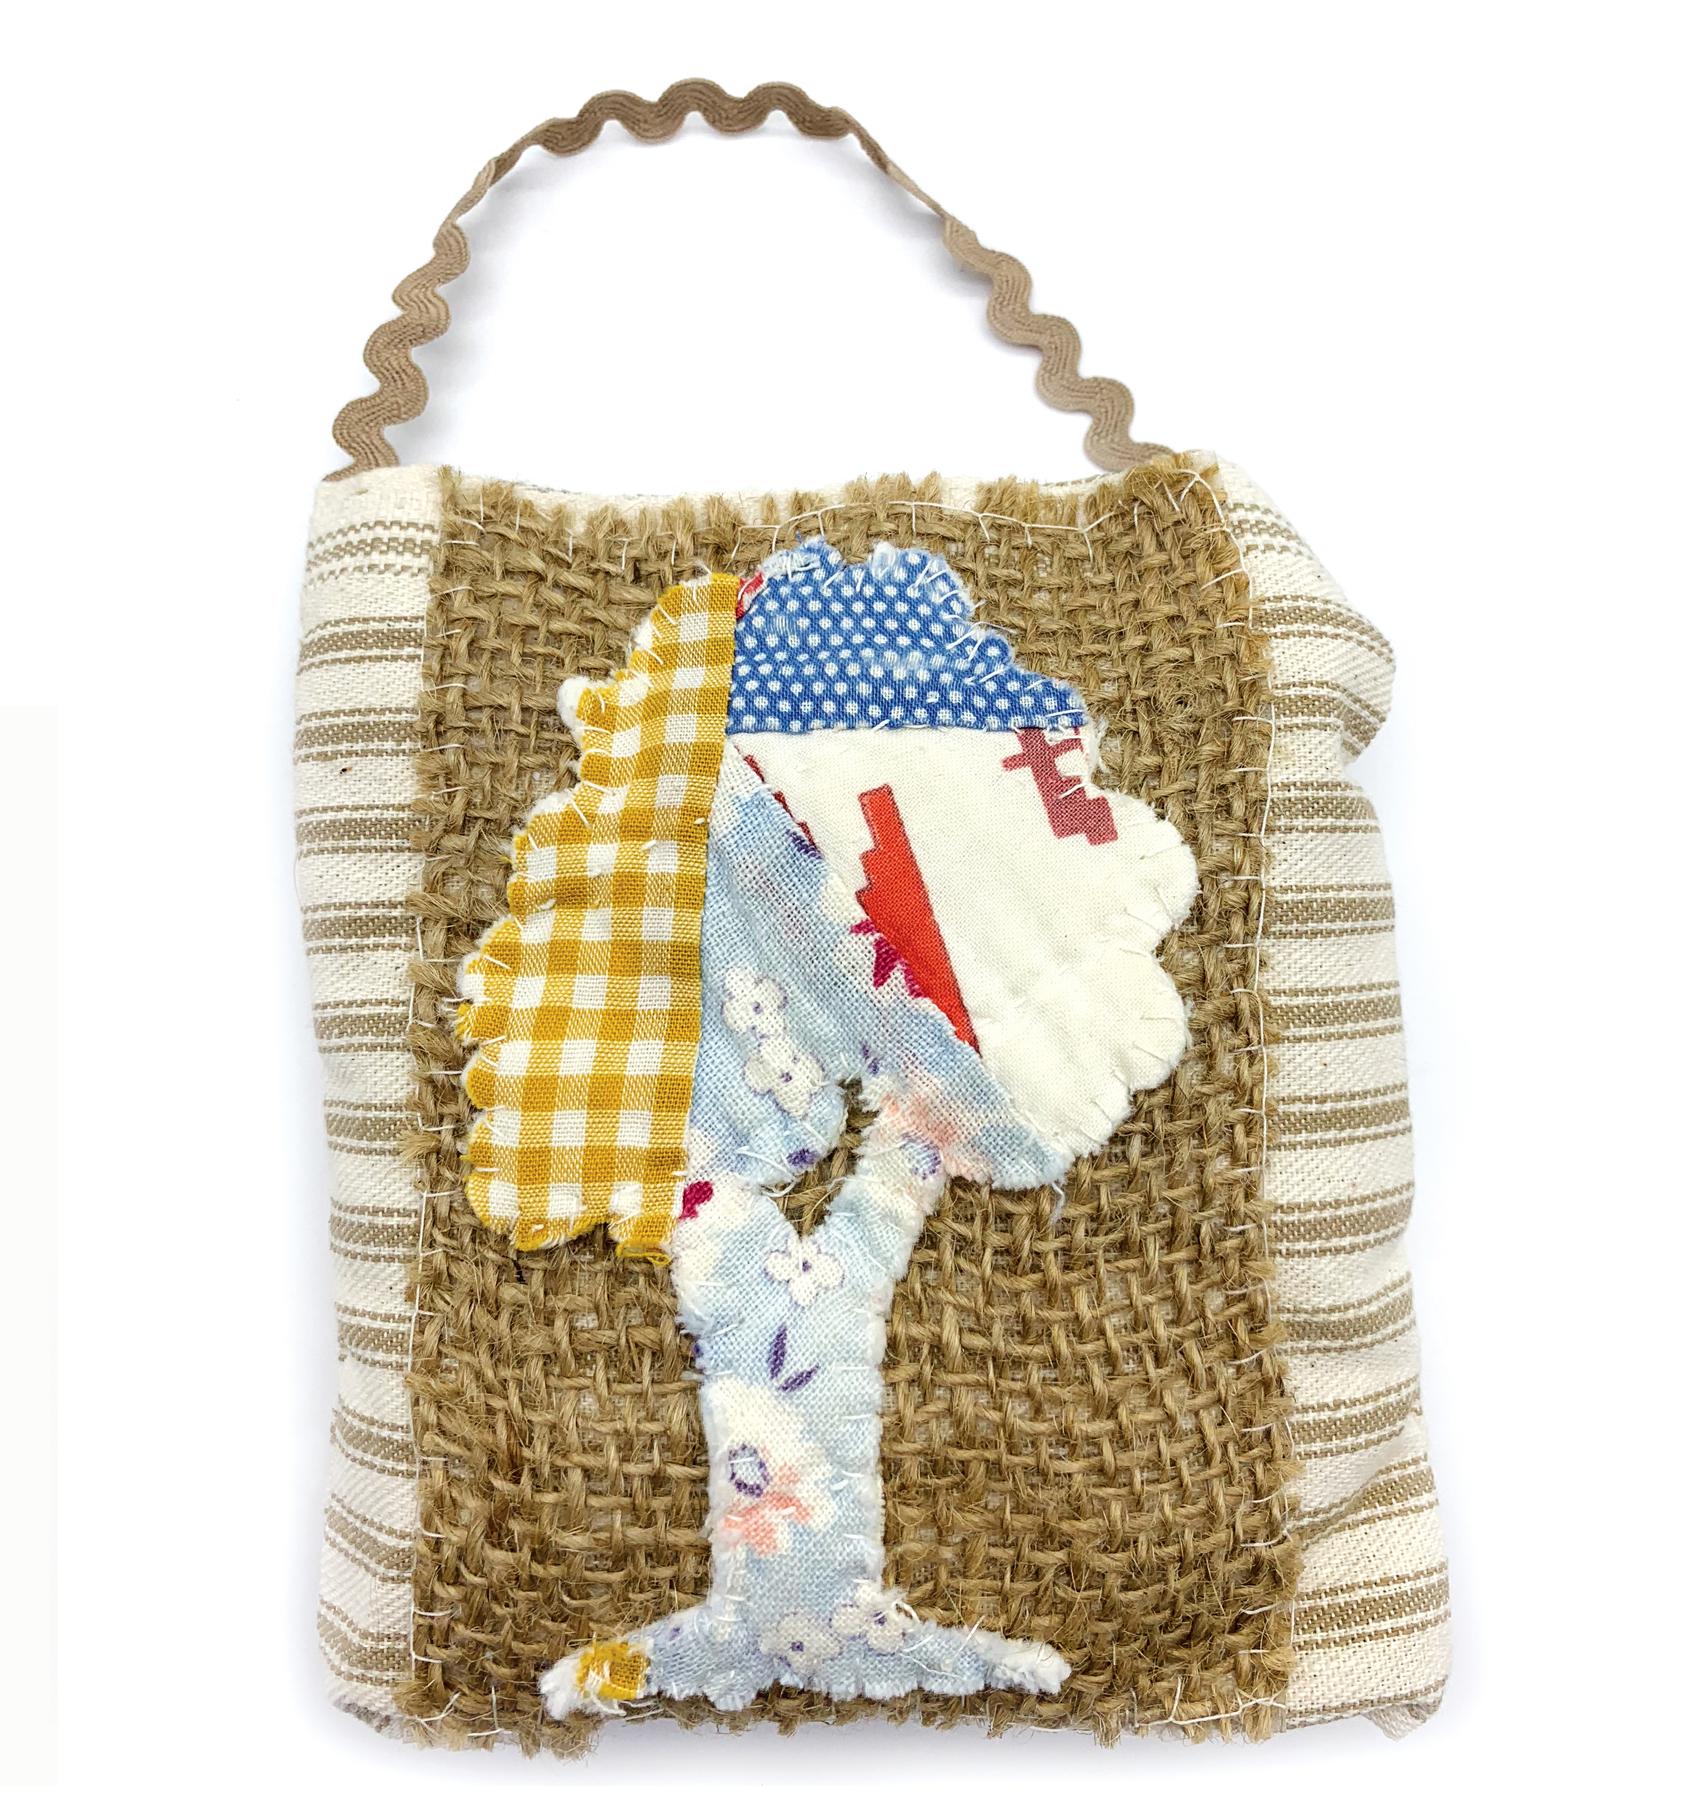 Isabella Handcrafted Cards Vintage Tree Quilt Hanger